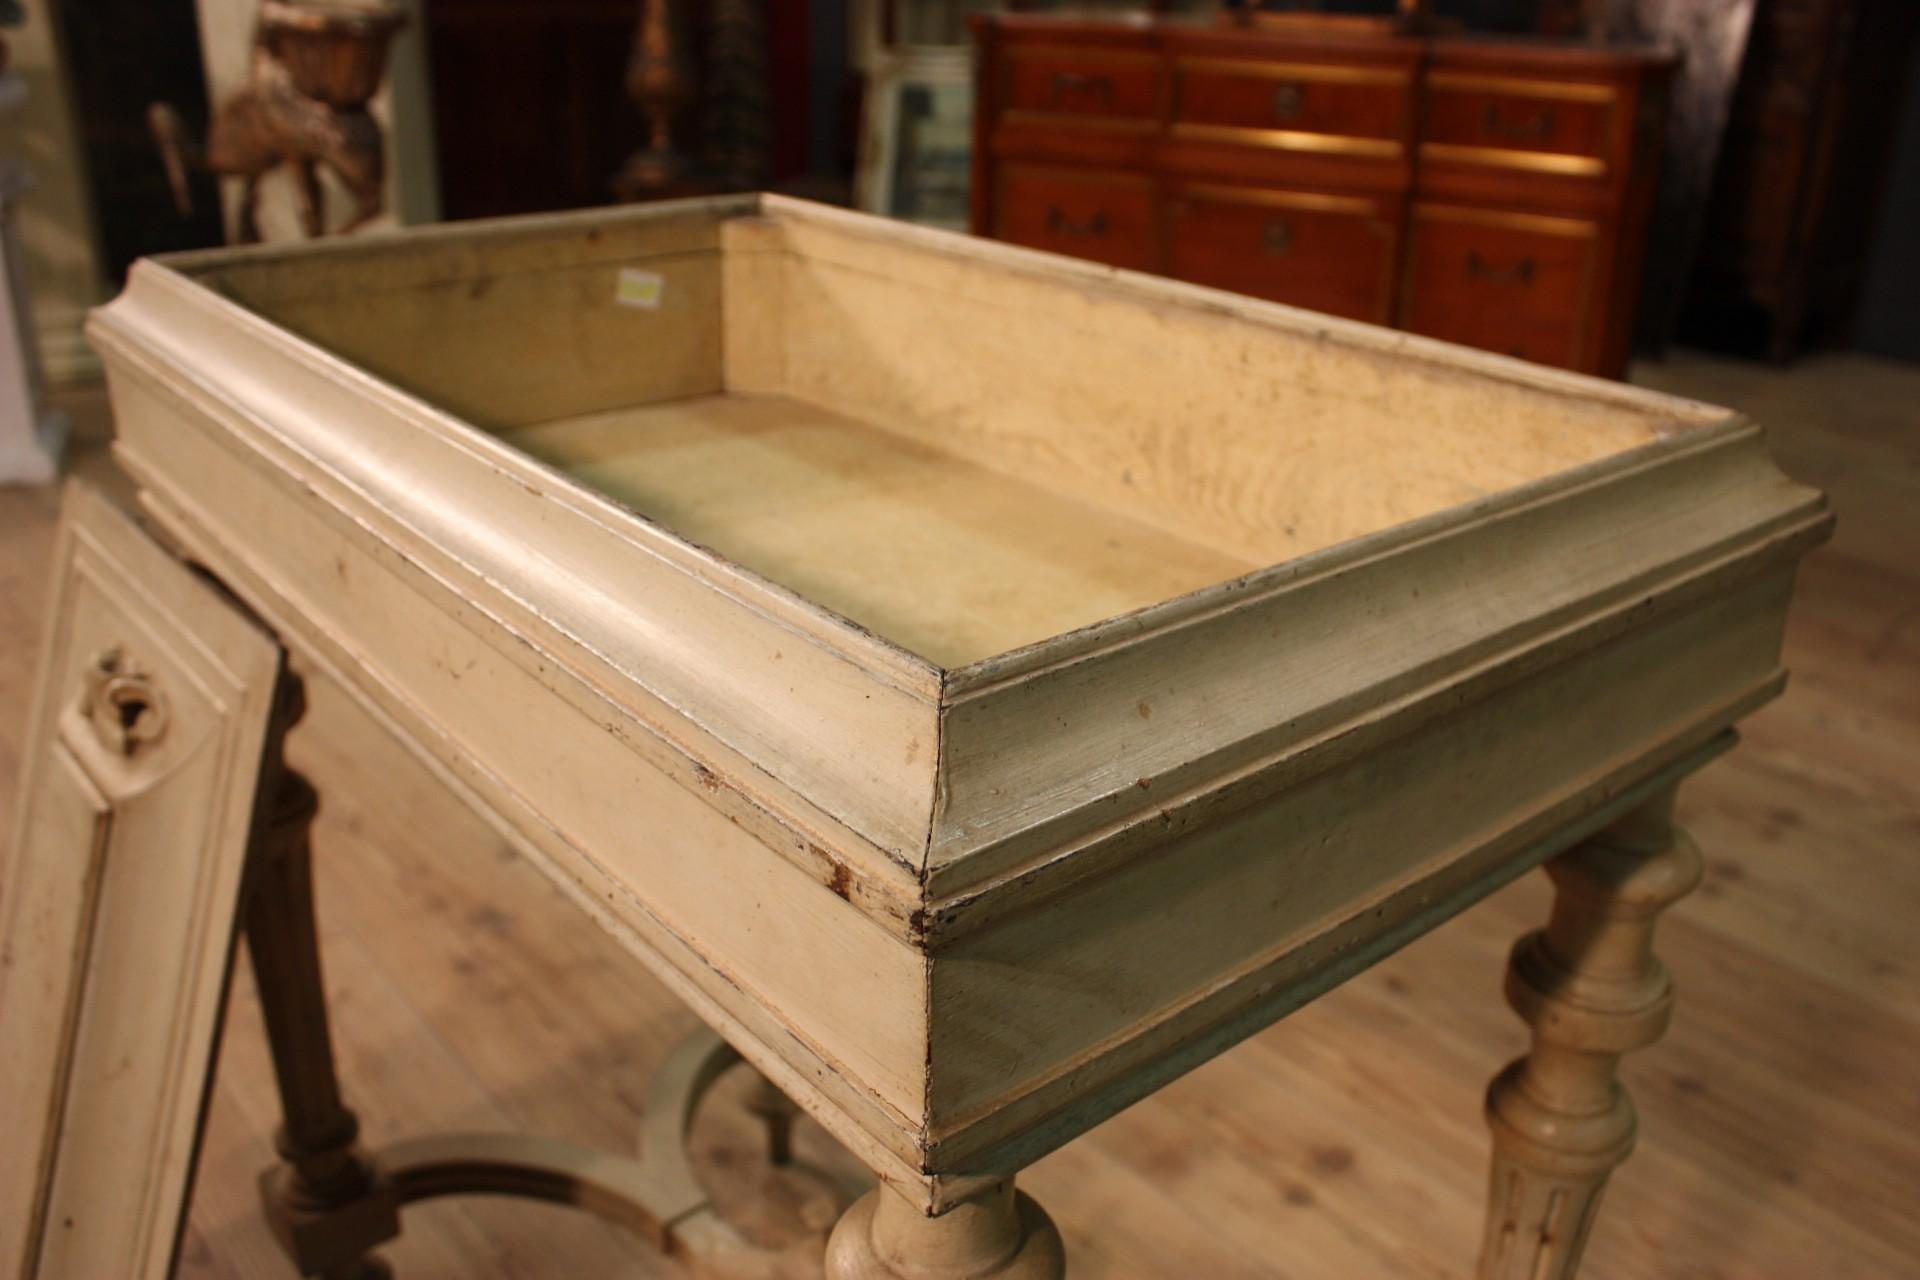 Kleiner tisch antike holz lackiert mobil tabelle aus - Holz hartegrade tabelle ...